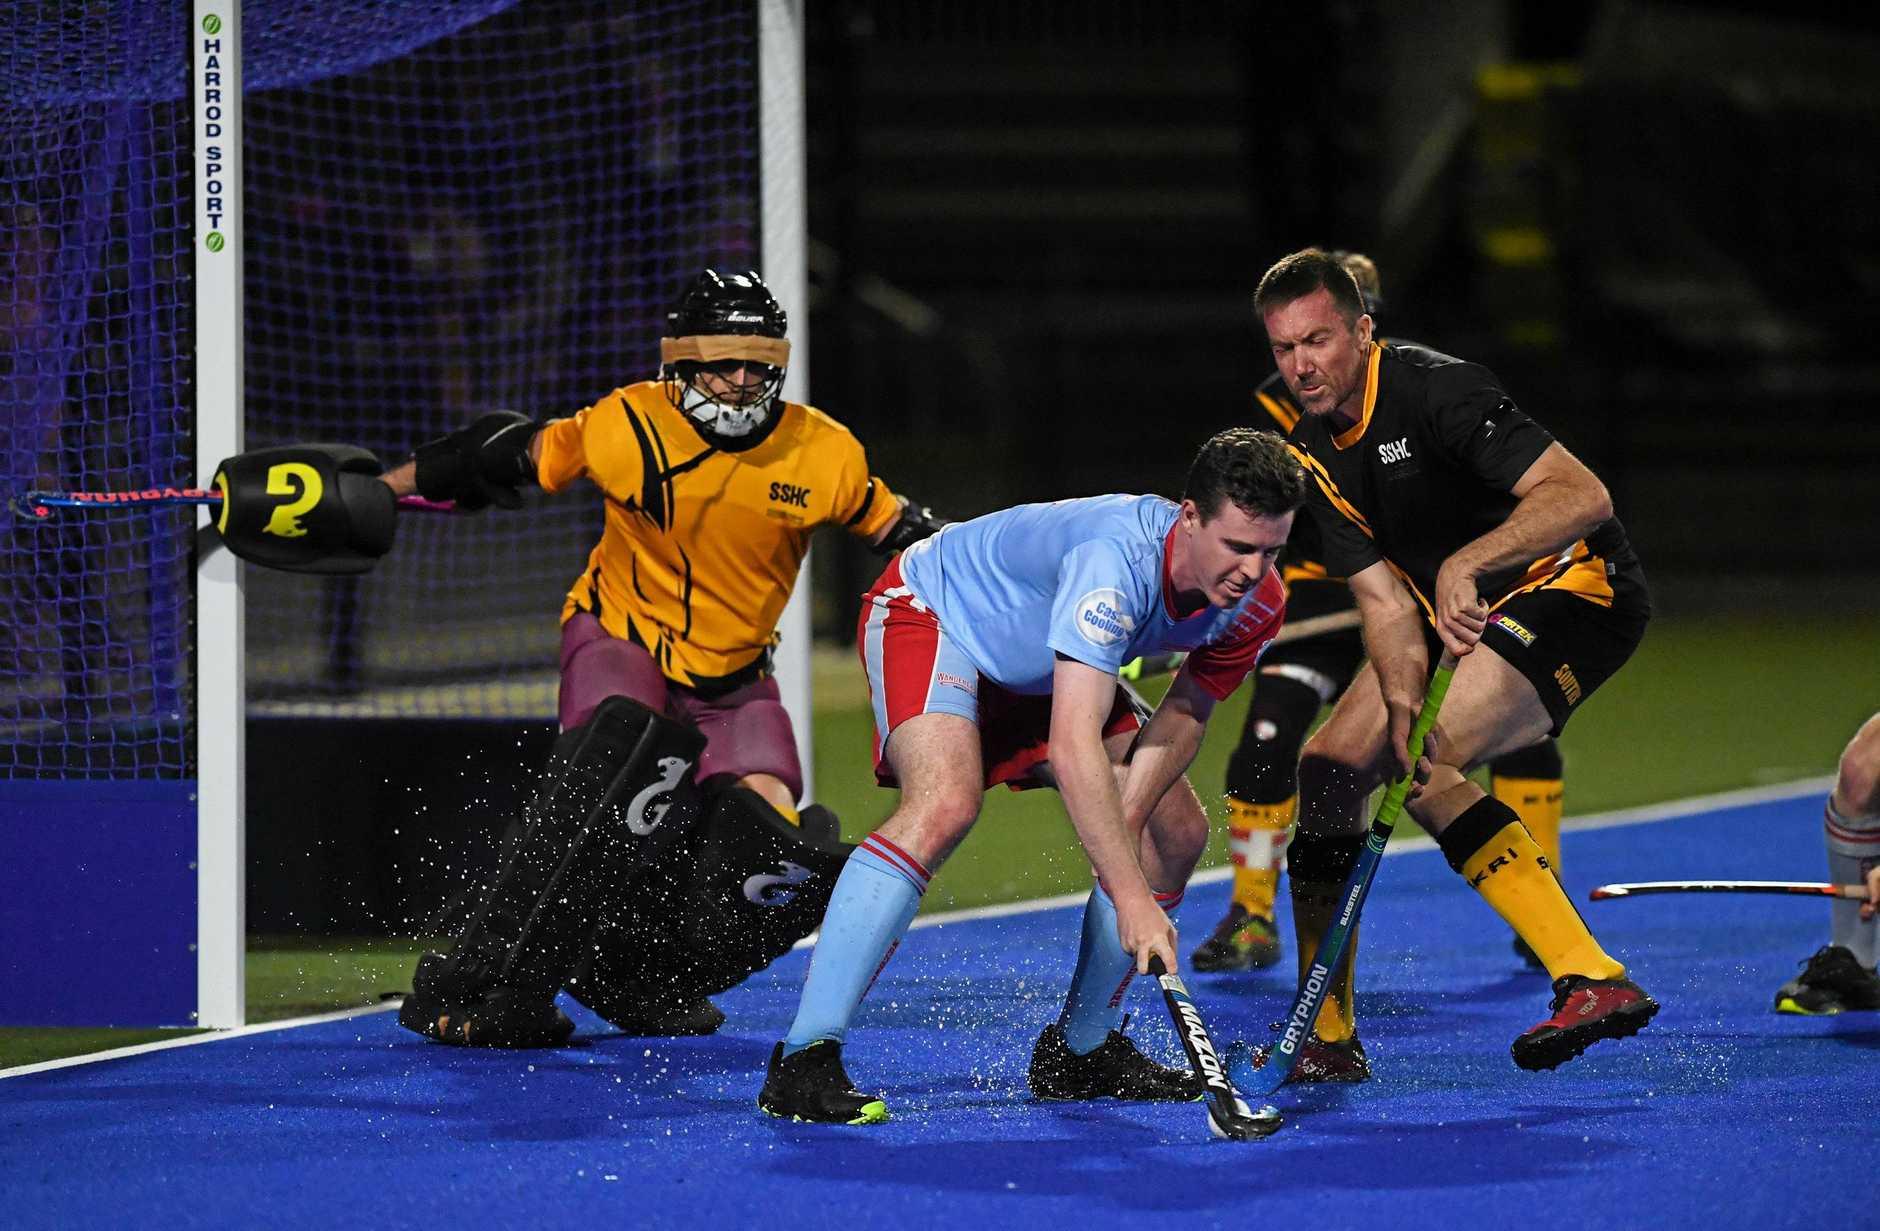 Hockey, Wanderers Brayden McKay shoots at Souths goalie Matt Olive